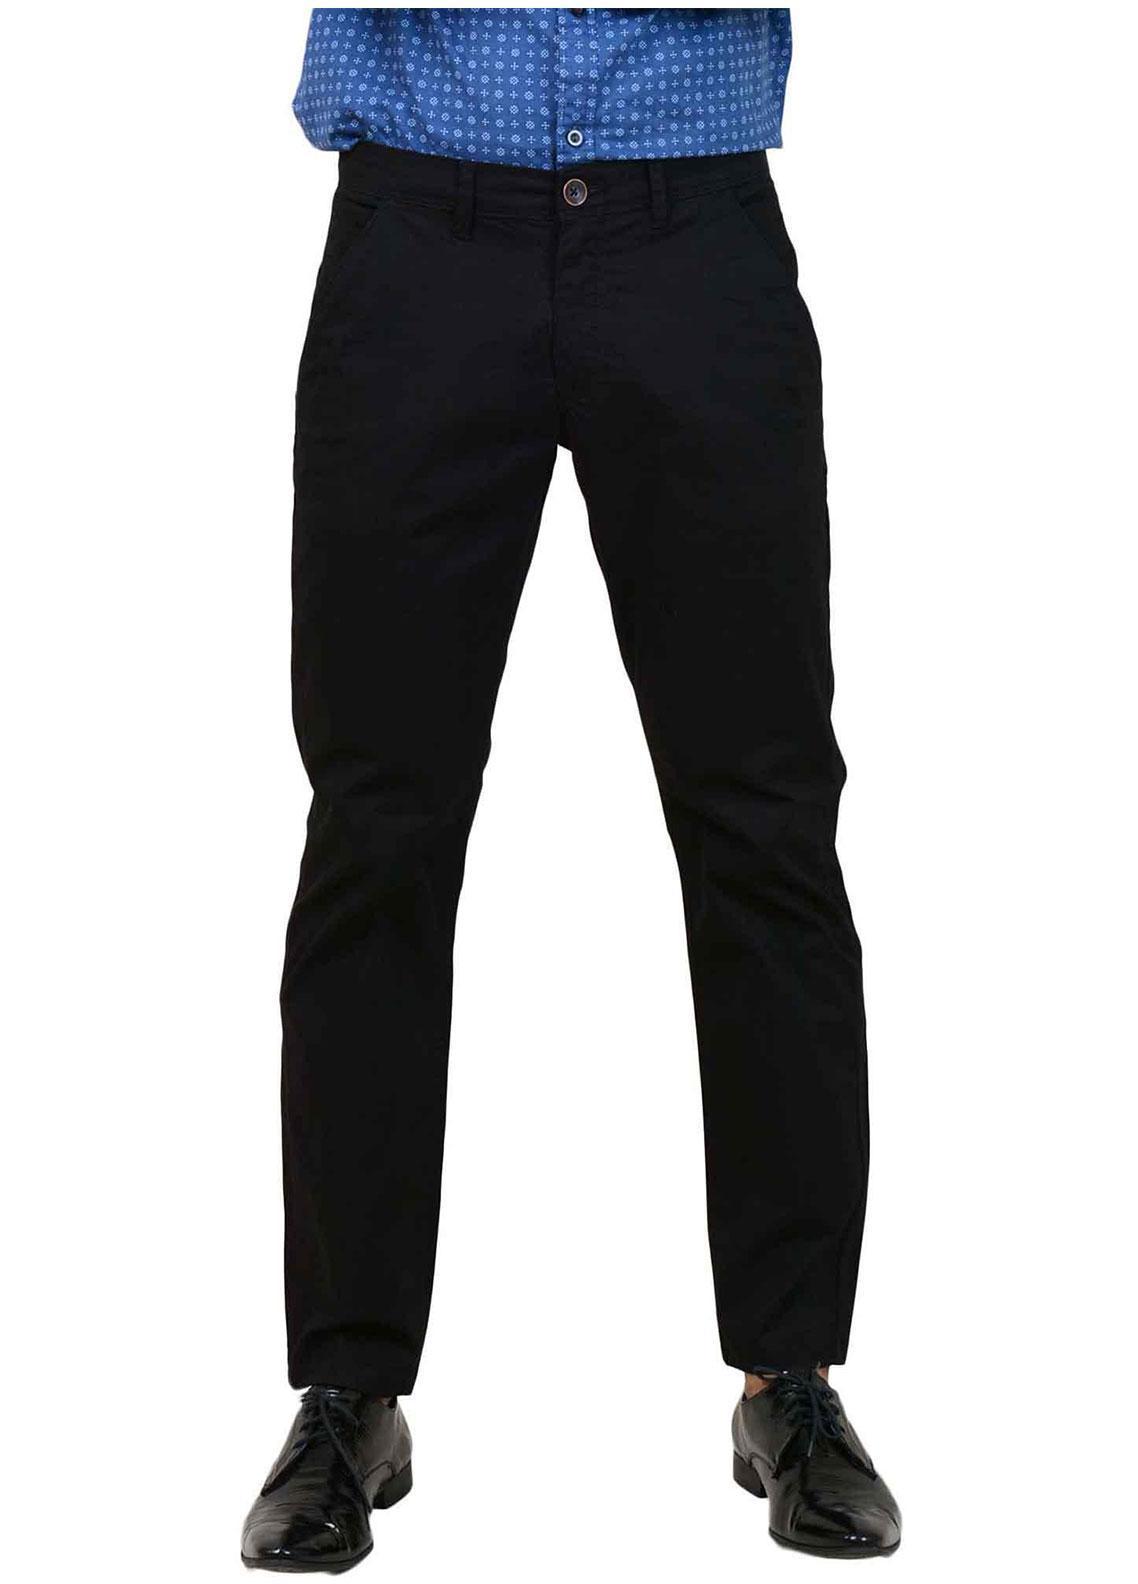 Ignite Wardrobe Cotton Stretchable Chino Pants for Men -  IG20PNM 017